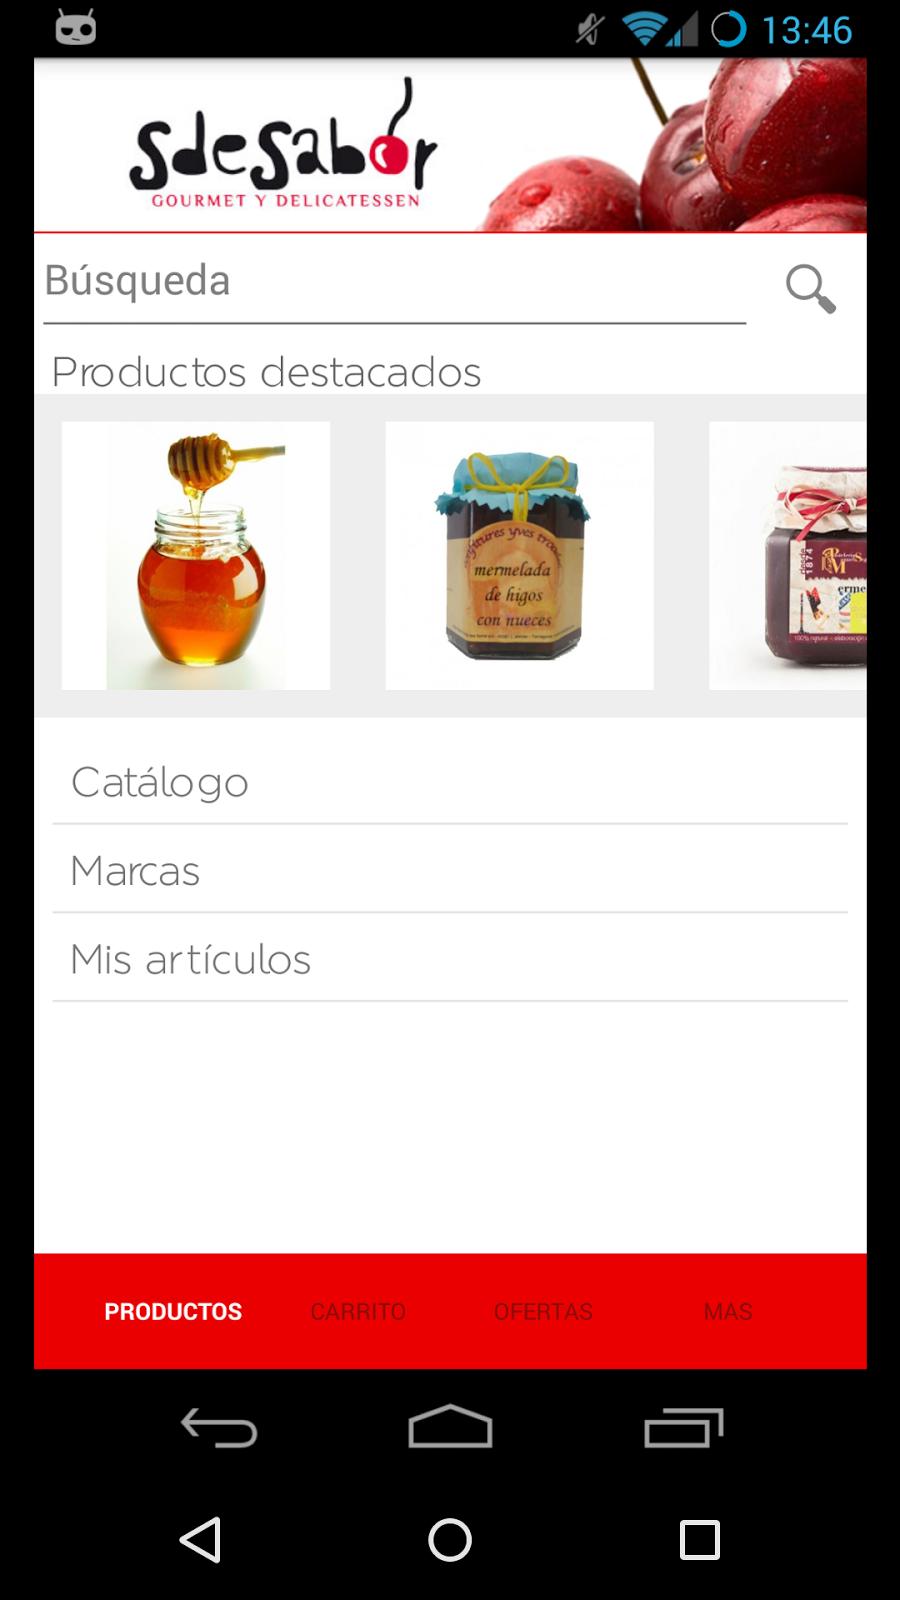 www.sdesabor.es